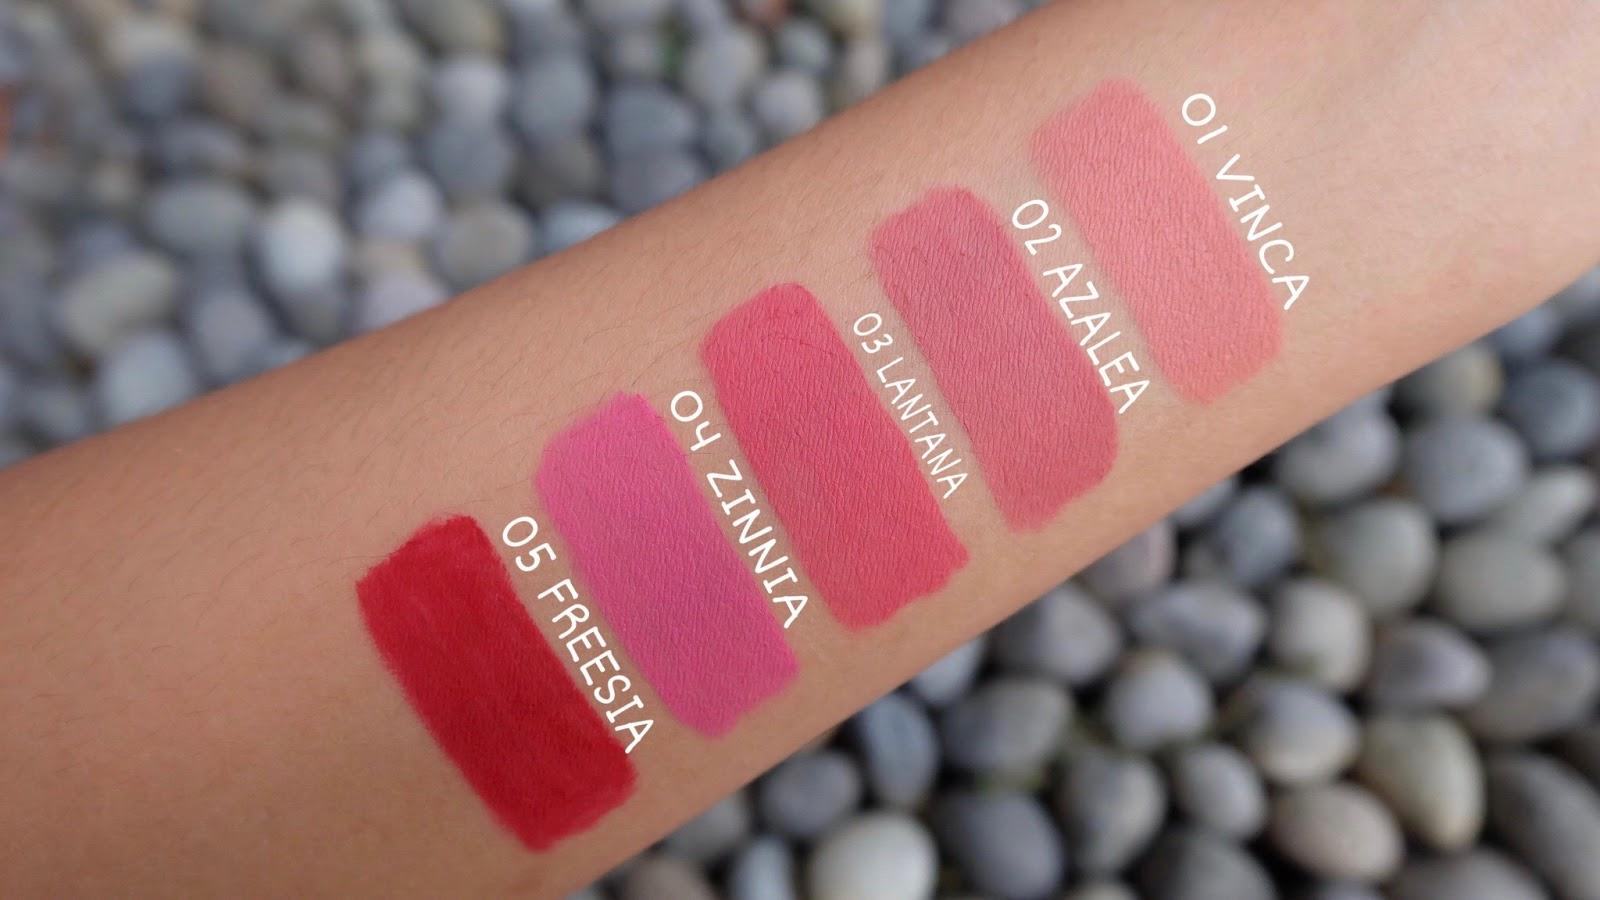 Review Purbasari Hi Matte Lip Cream F A S H I O N C Lipstick Swatches